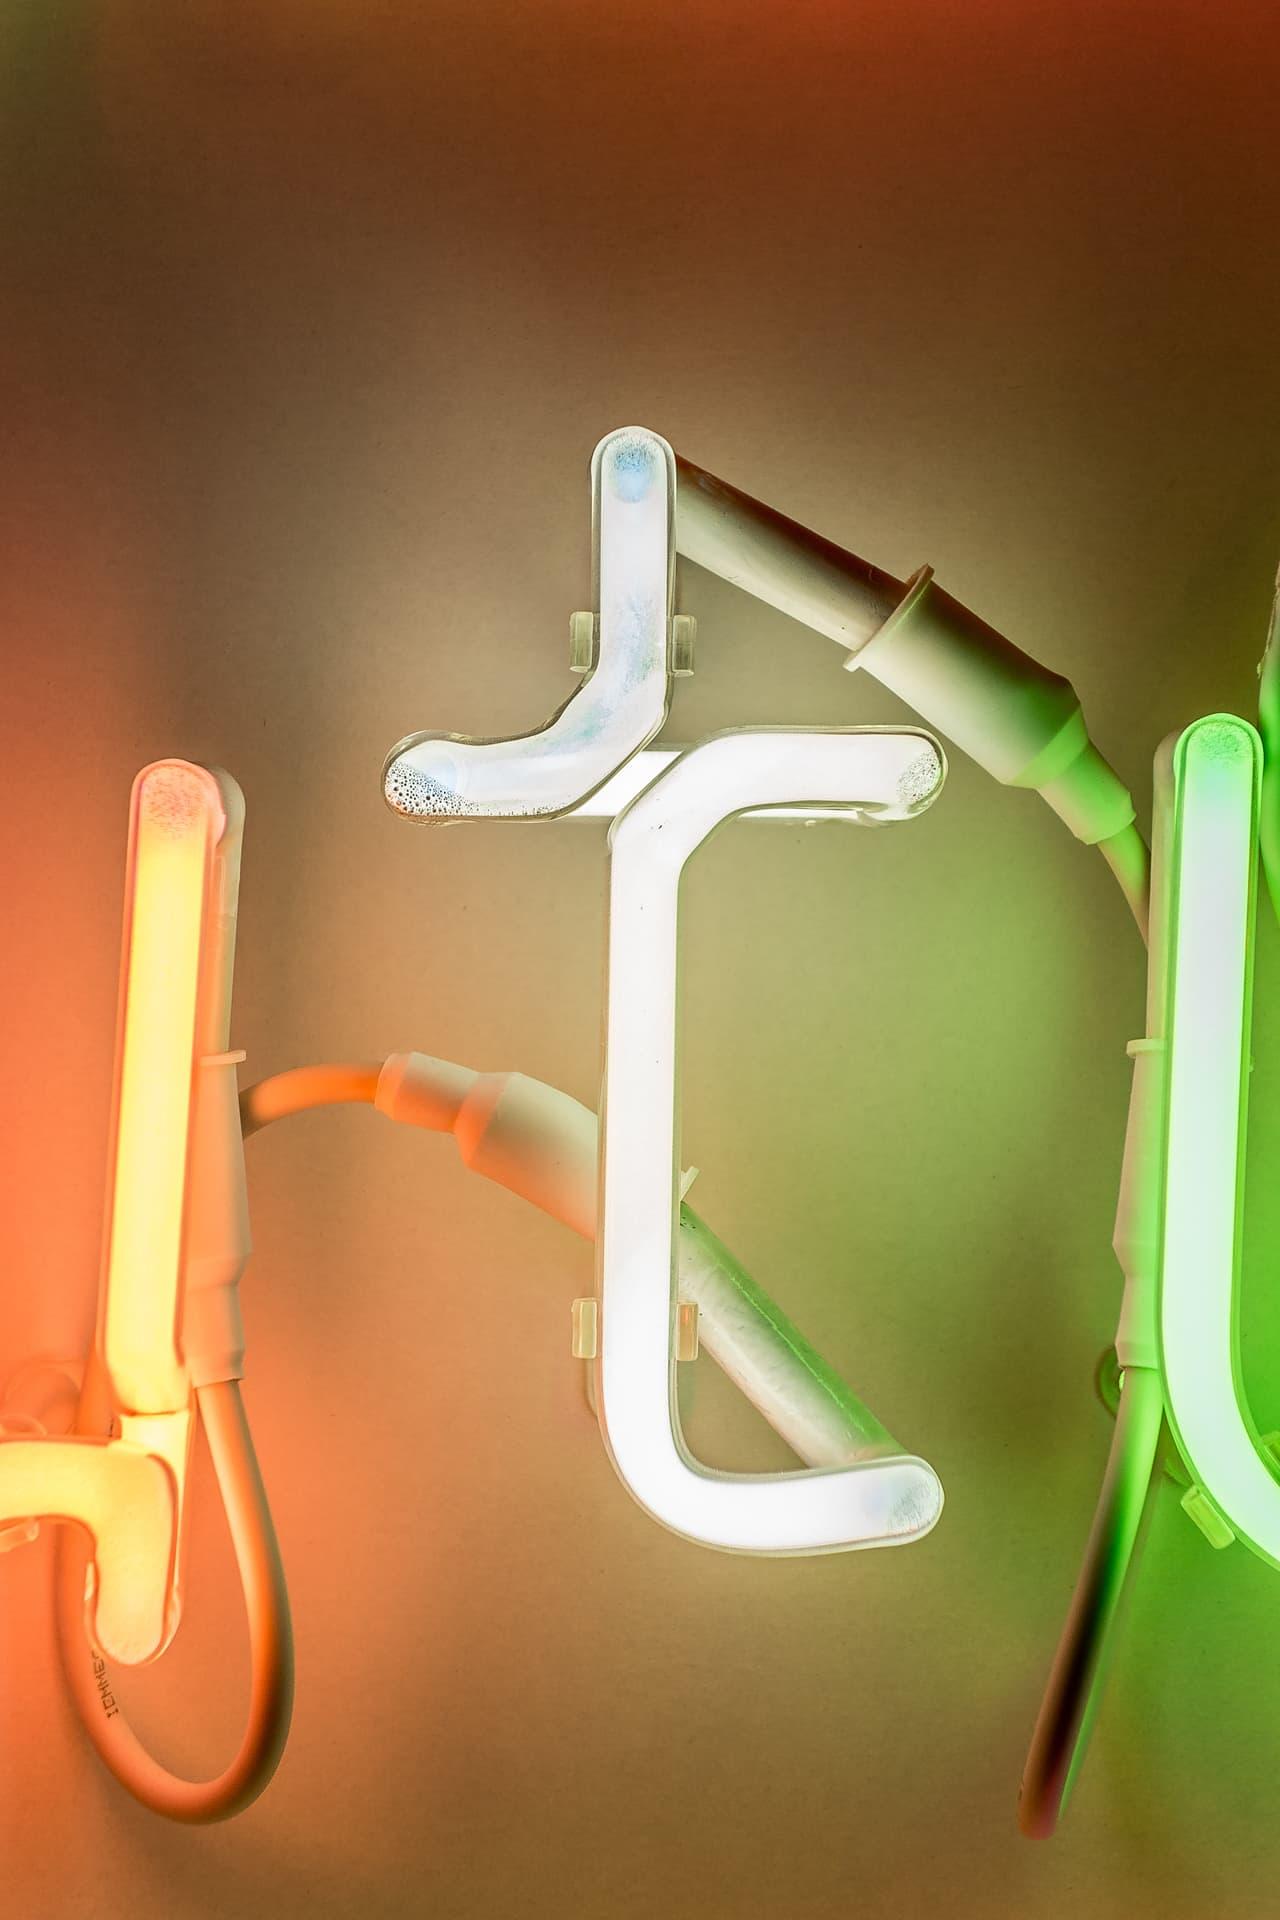 neon t piqt fotokunst limitierte kunstwerke. Black Bedroom Furniture Sets. Home Design Ideas